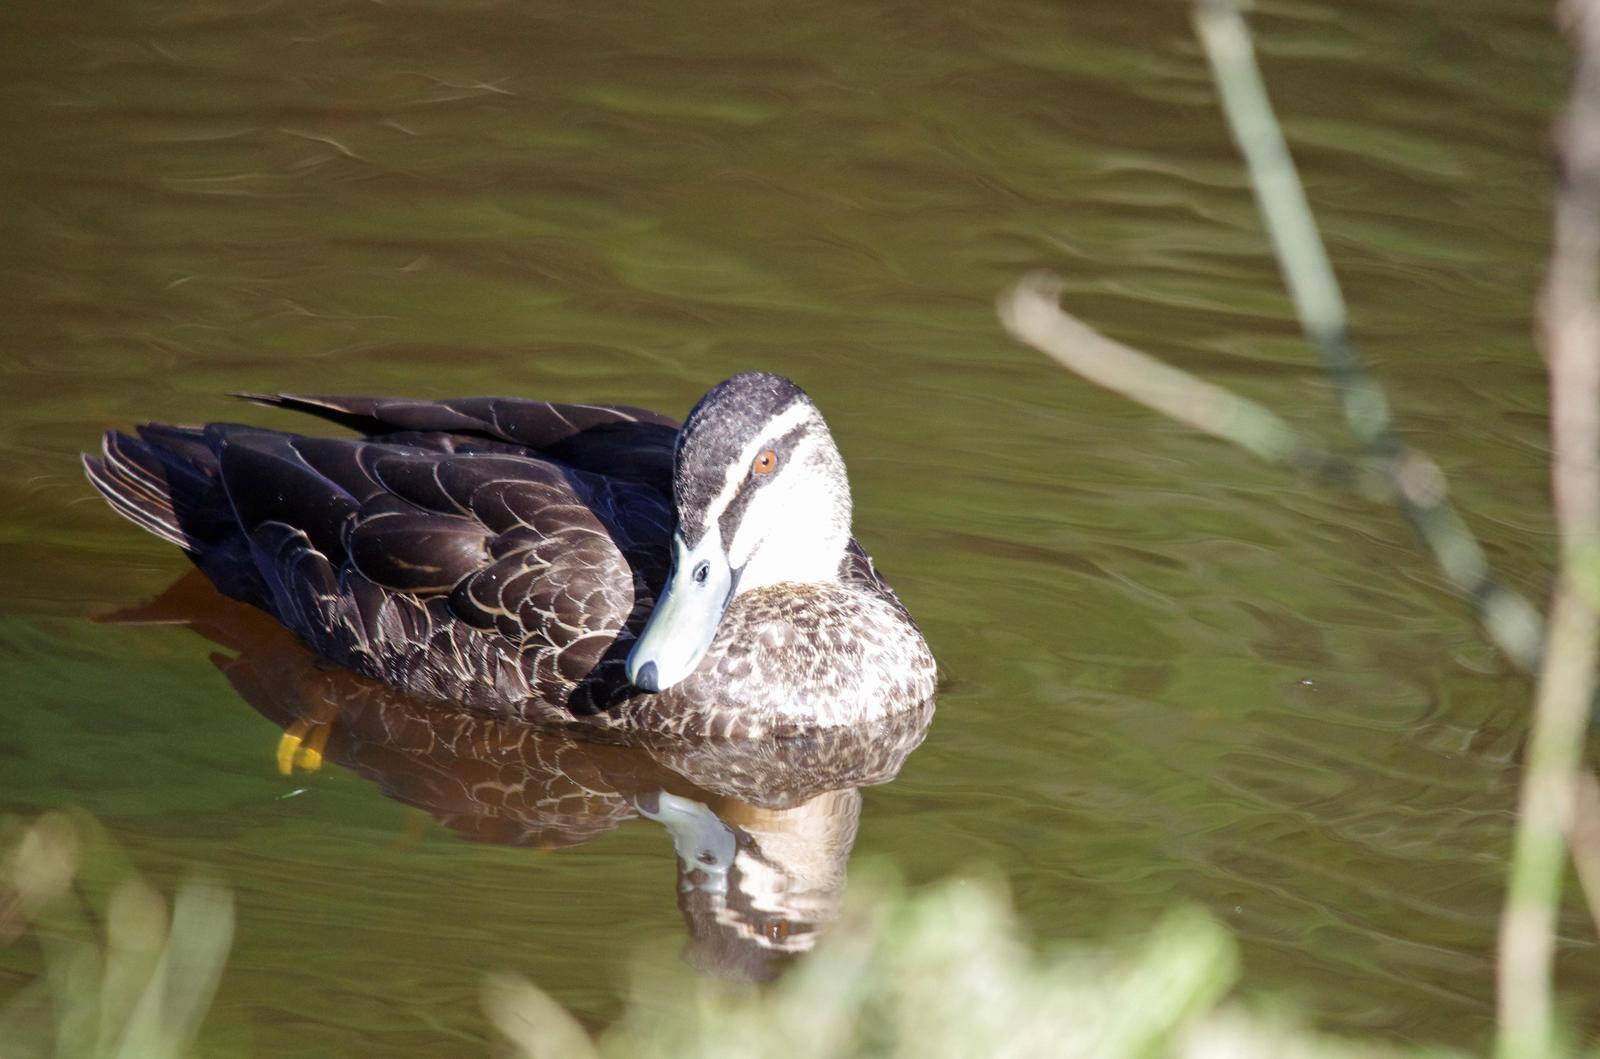 Pacific Black Duck Photo by Richard Lund